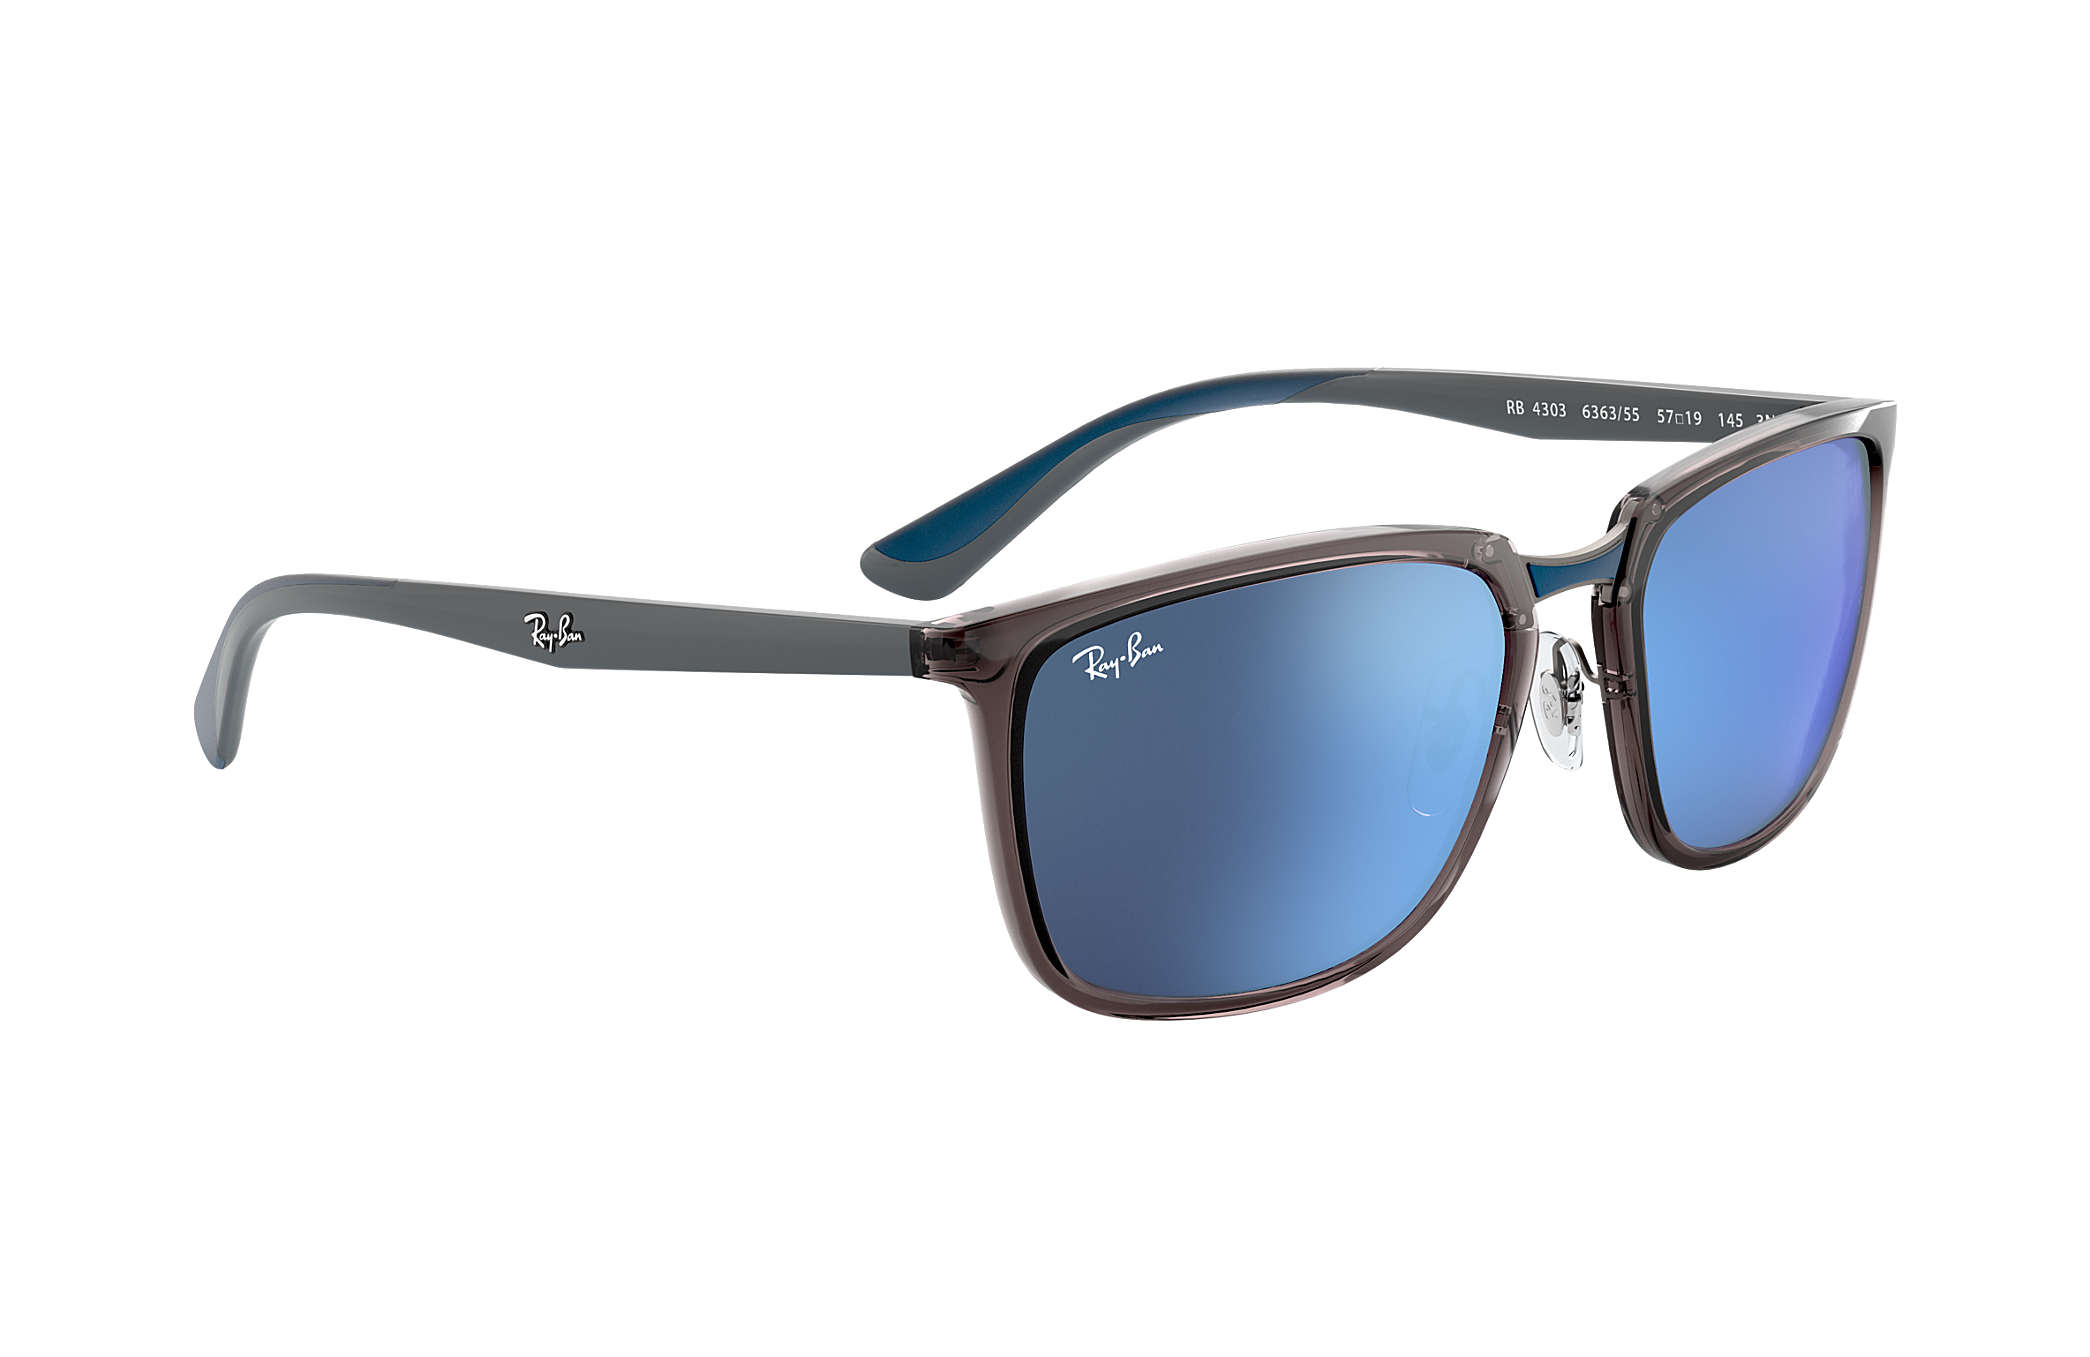 470b195b0a Ray-Ban RB4303 Grey - Nylon - Blue Lenses - 0RB430363635557